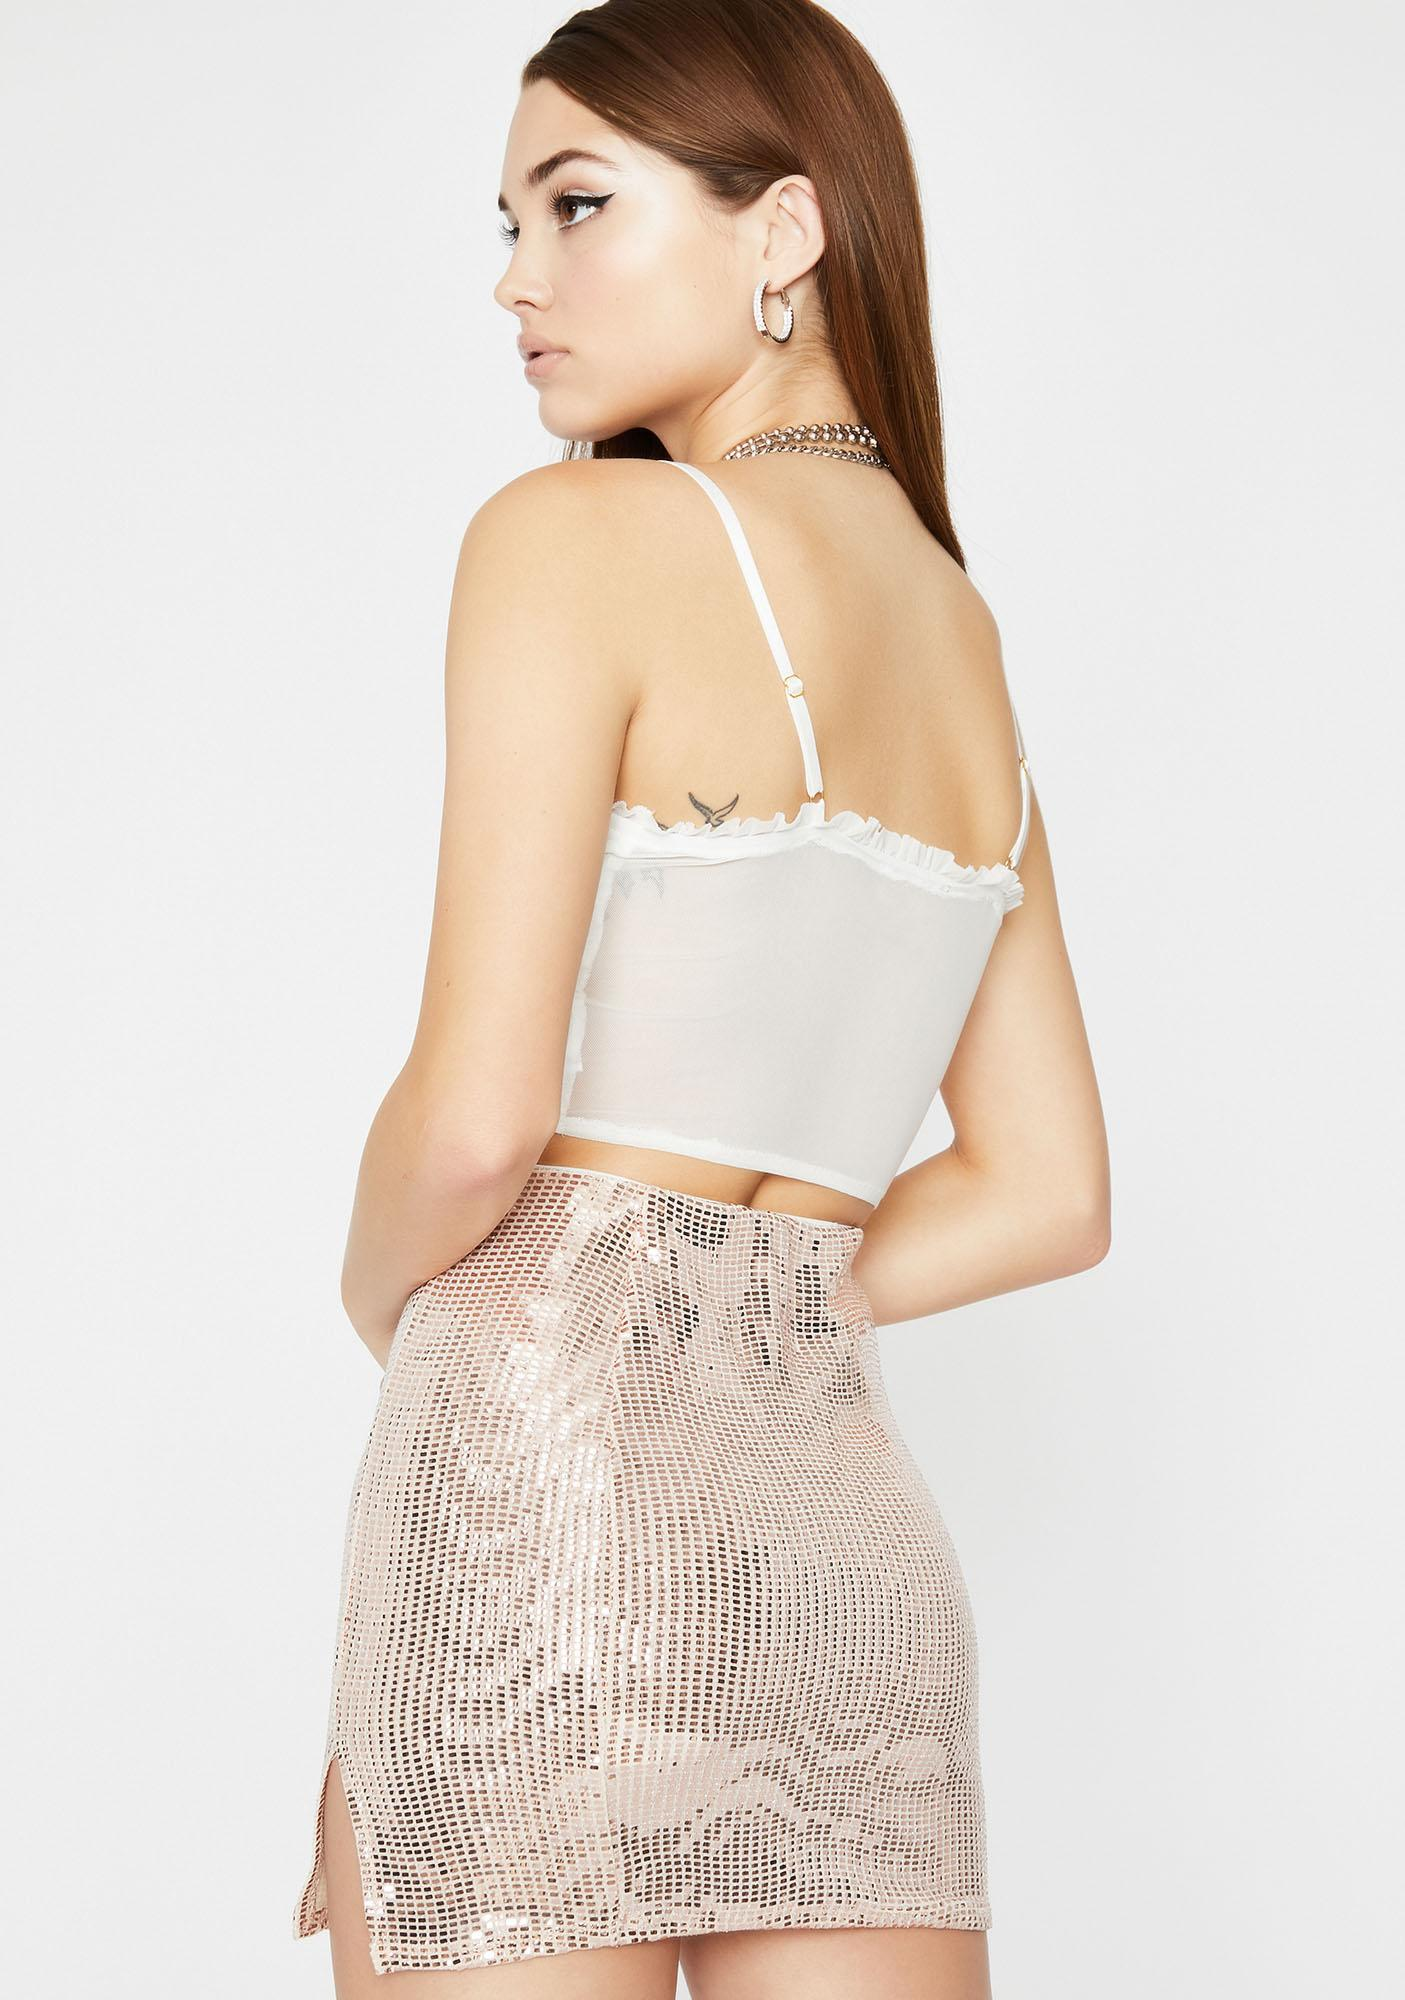 Glossy Galore Sequin Skirt